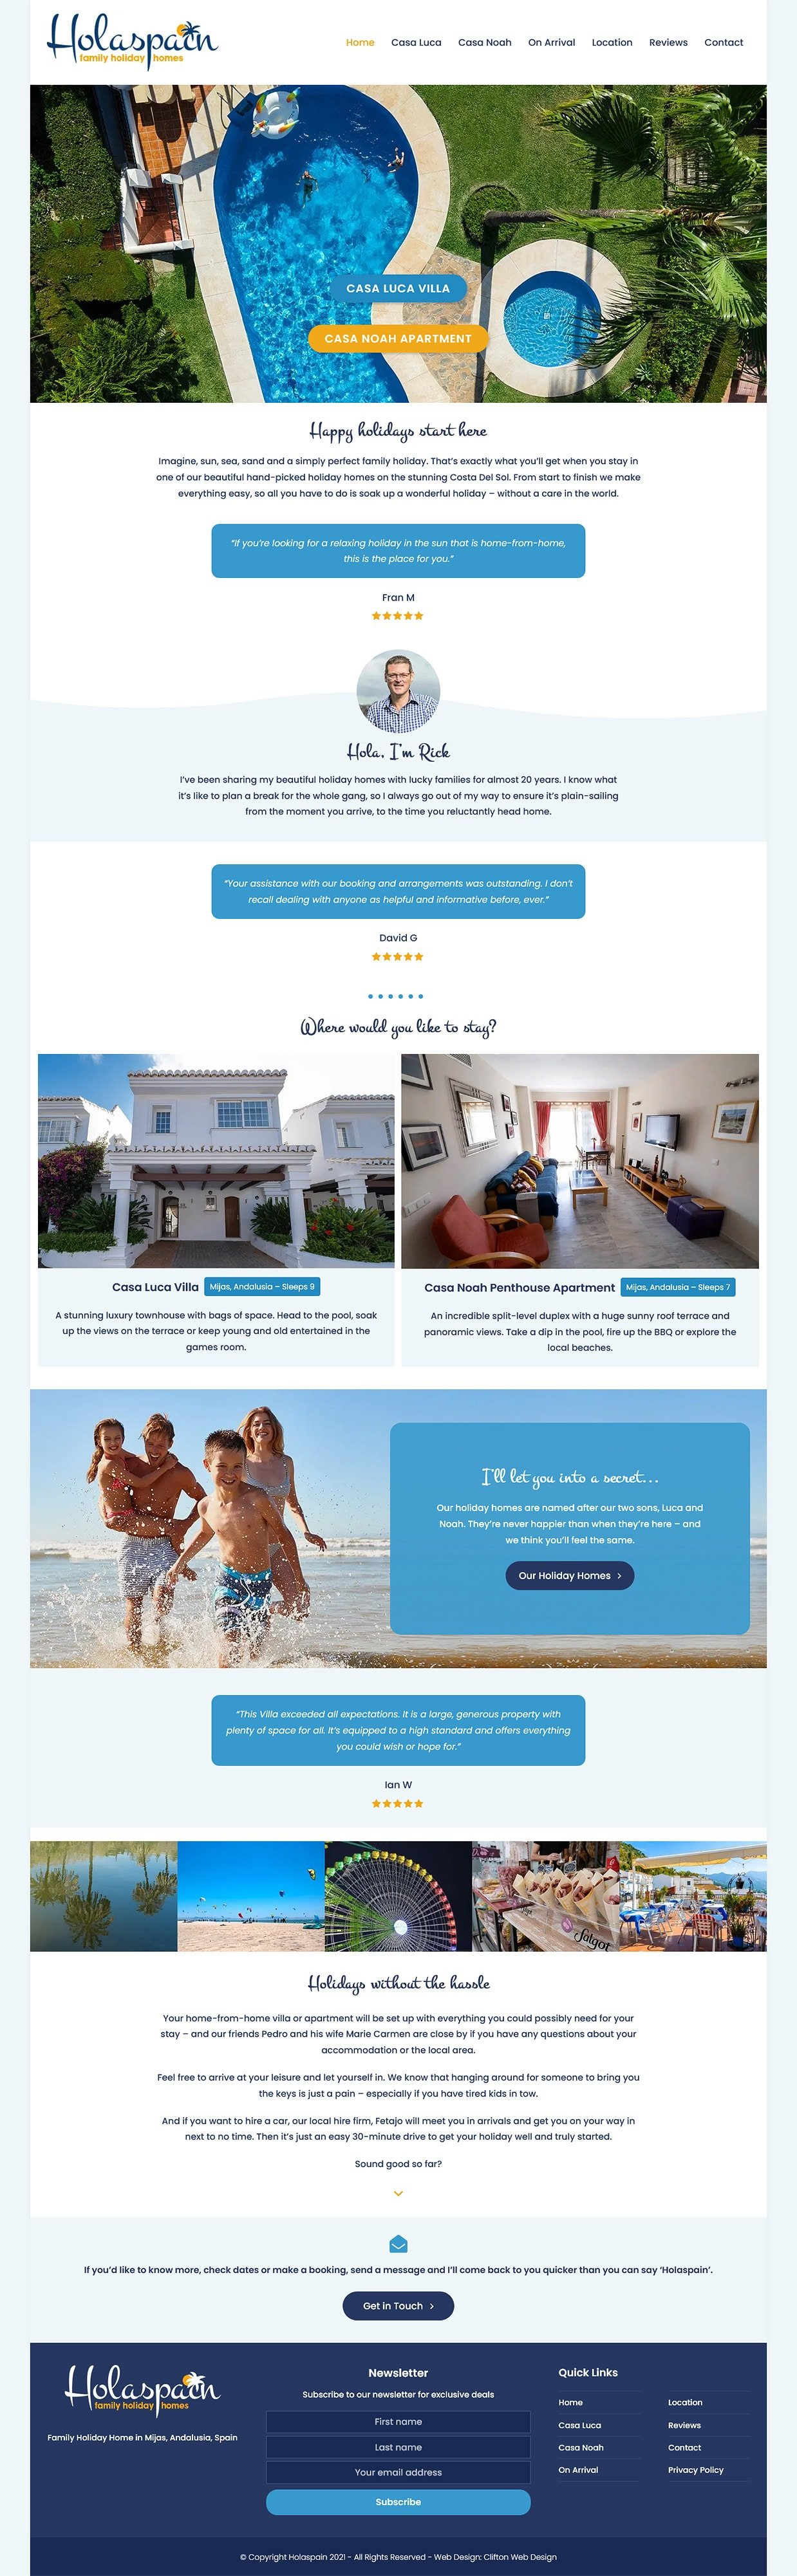 Website screenshot - Hola Spain